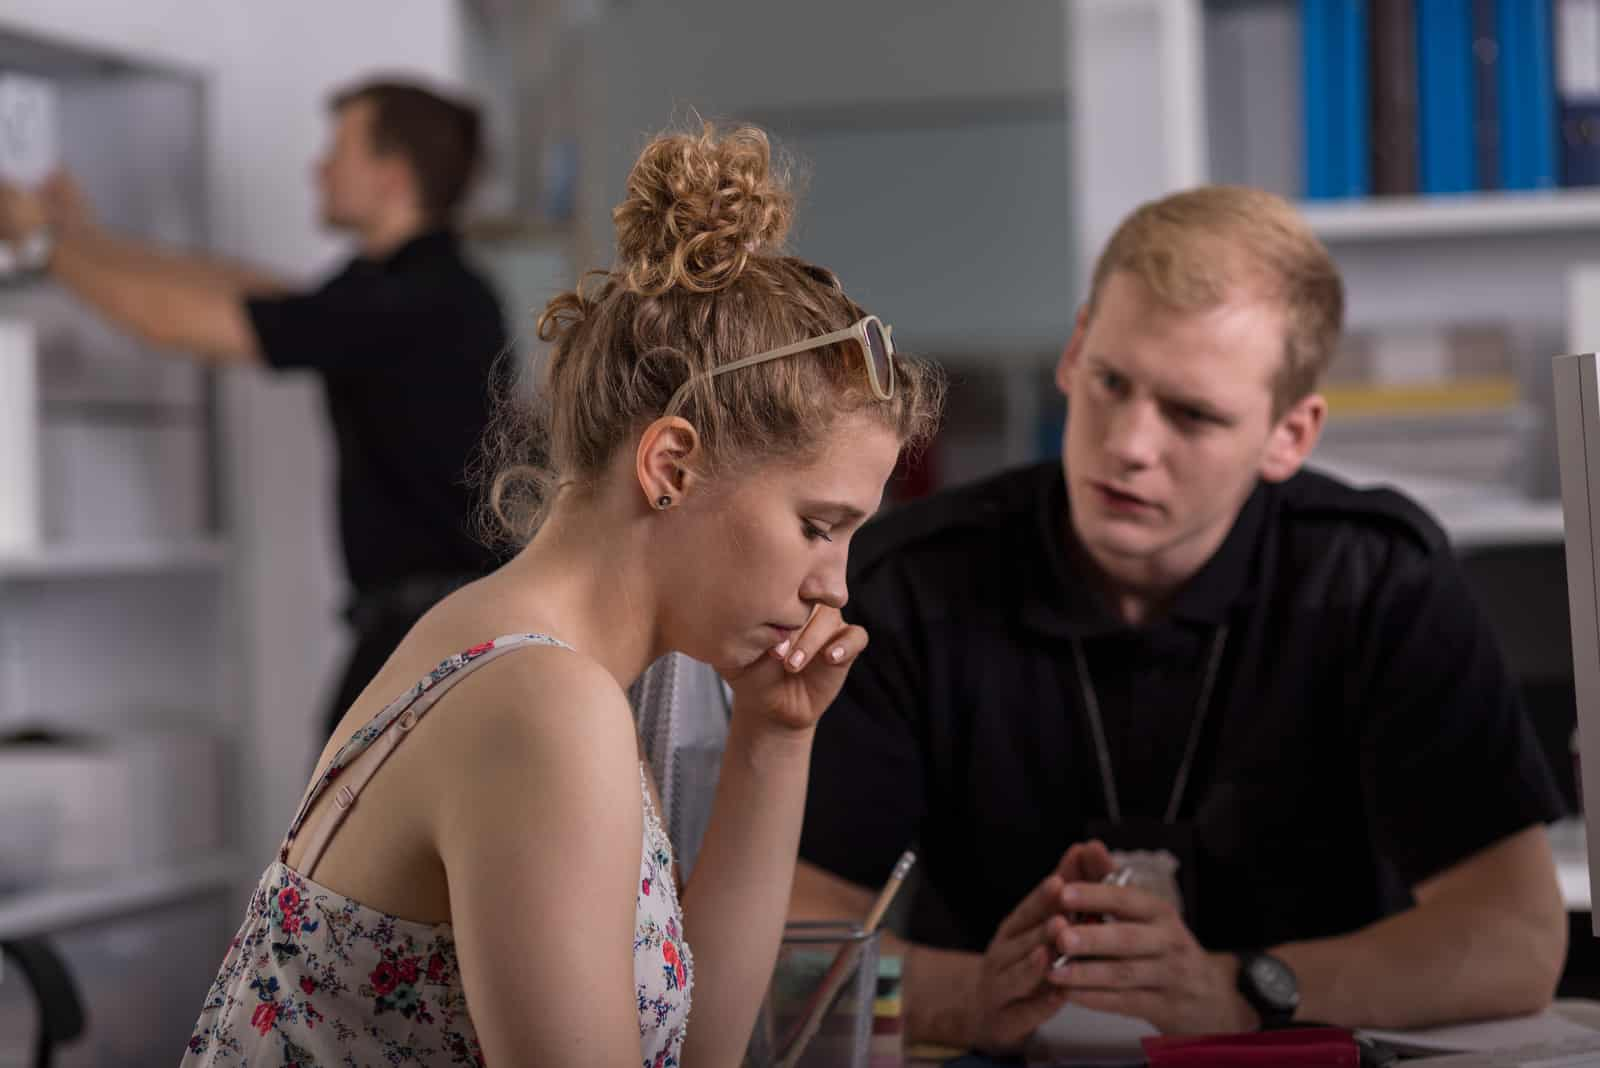 a downcast woman talks to a man